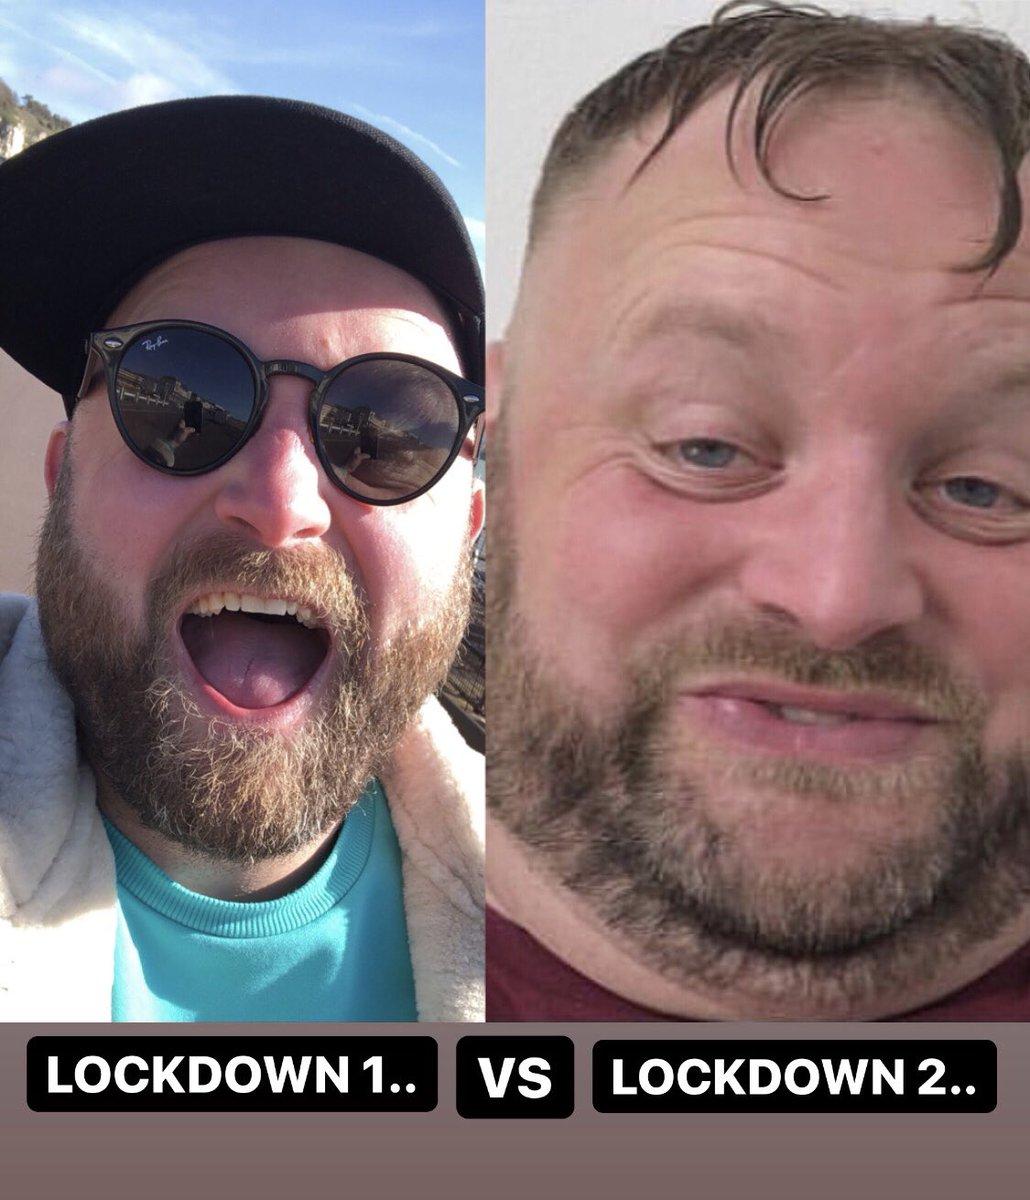 Me entering lockdown 1 Vs Lockdown 2.. https://t.co/4195m0QXCM